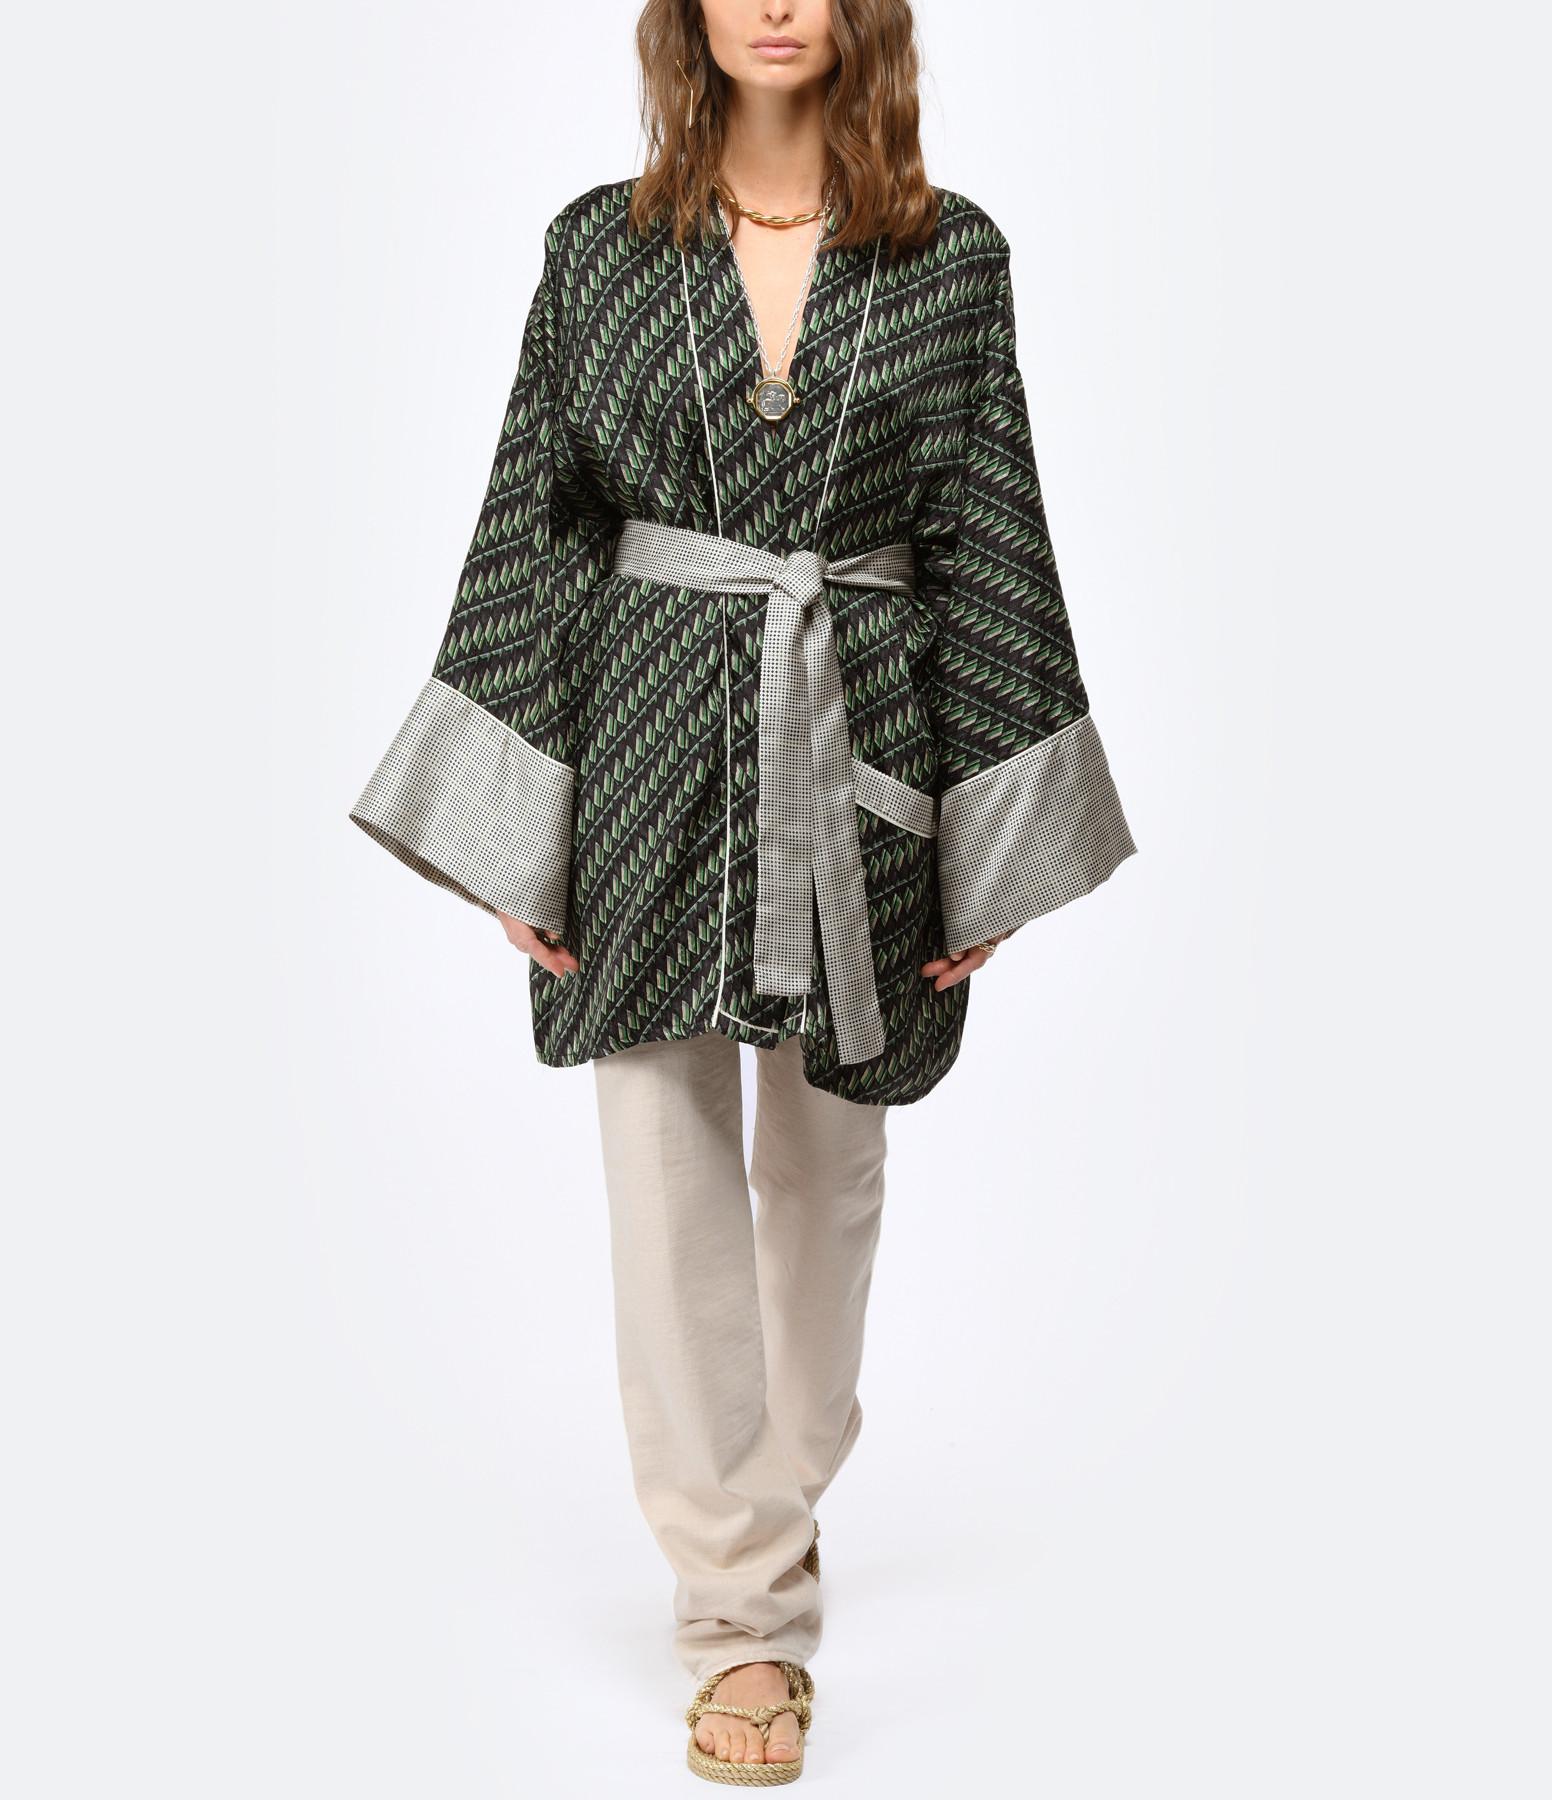 MOW PARIS - Kimono Maggy Soie Imprimé Dominico Alvaro